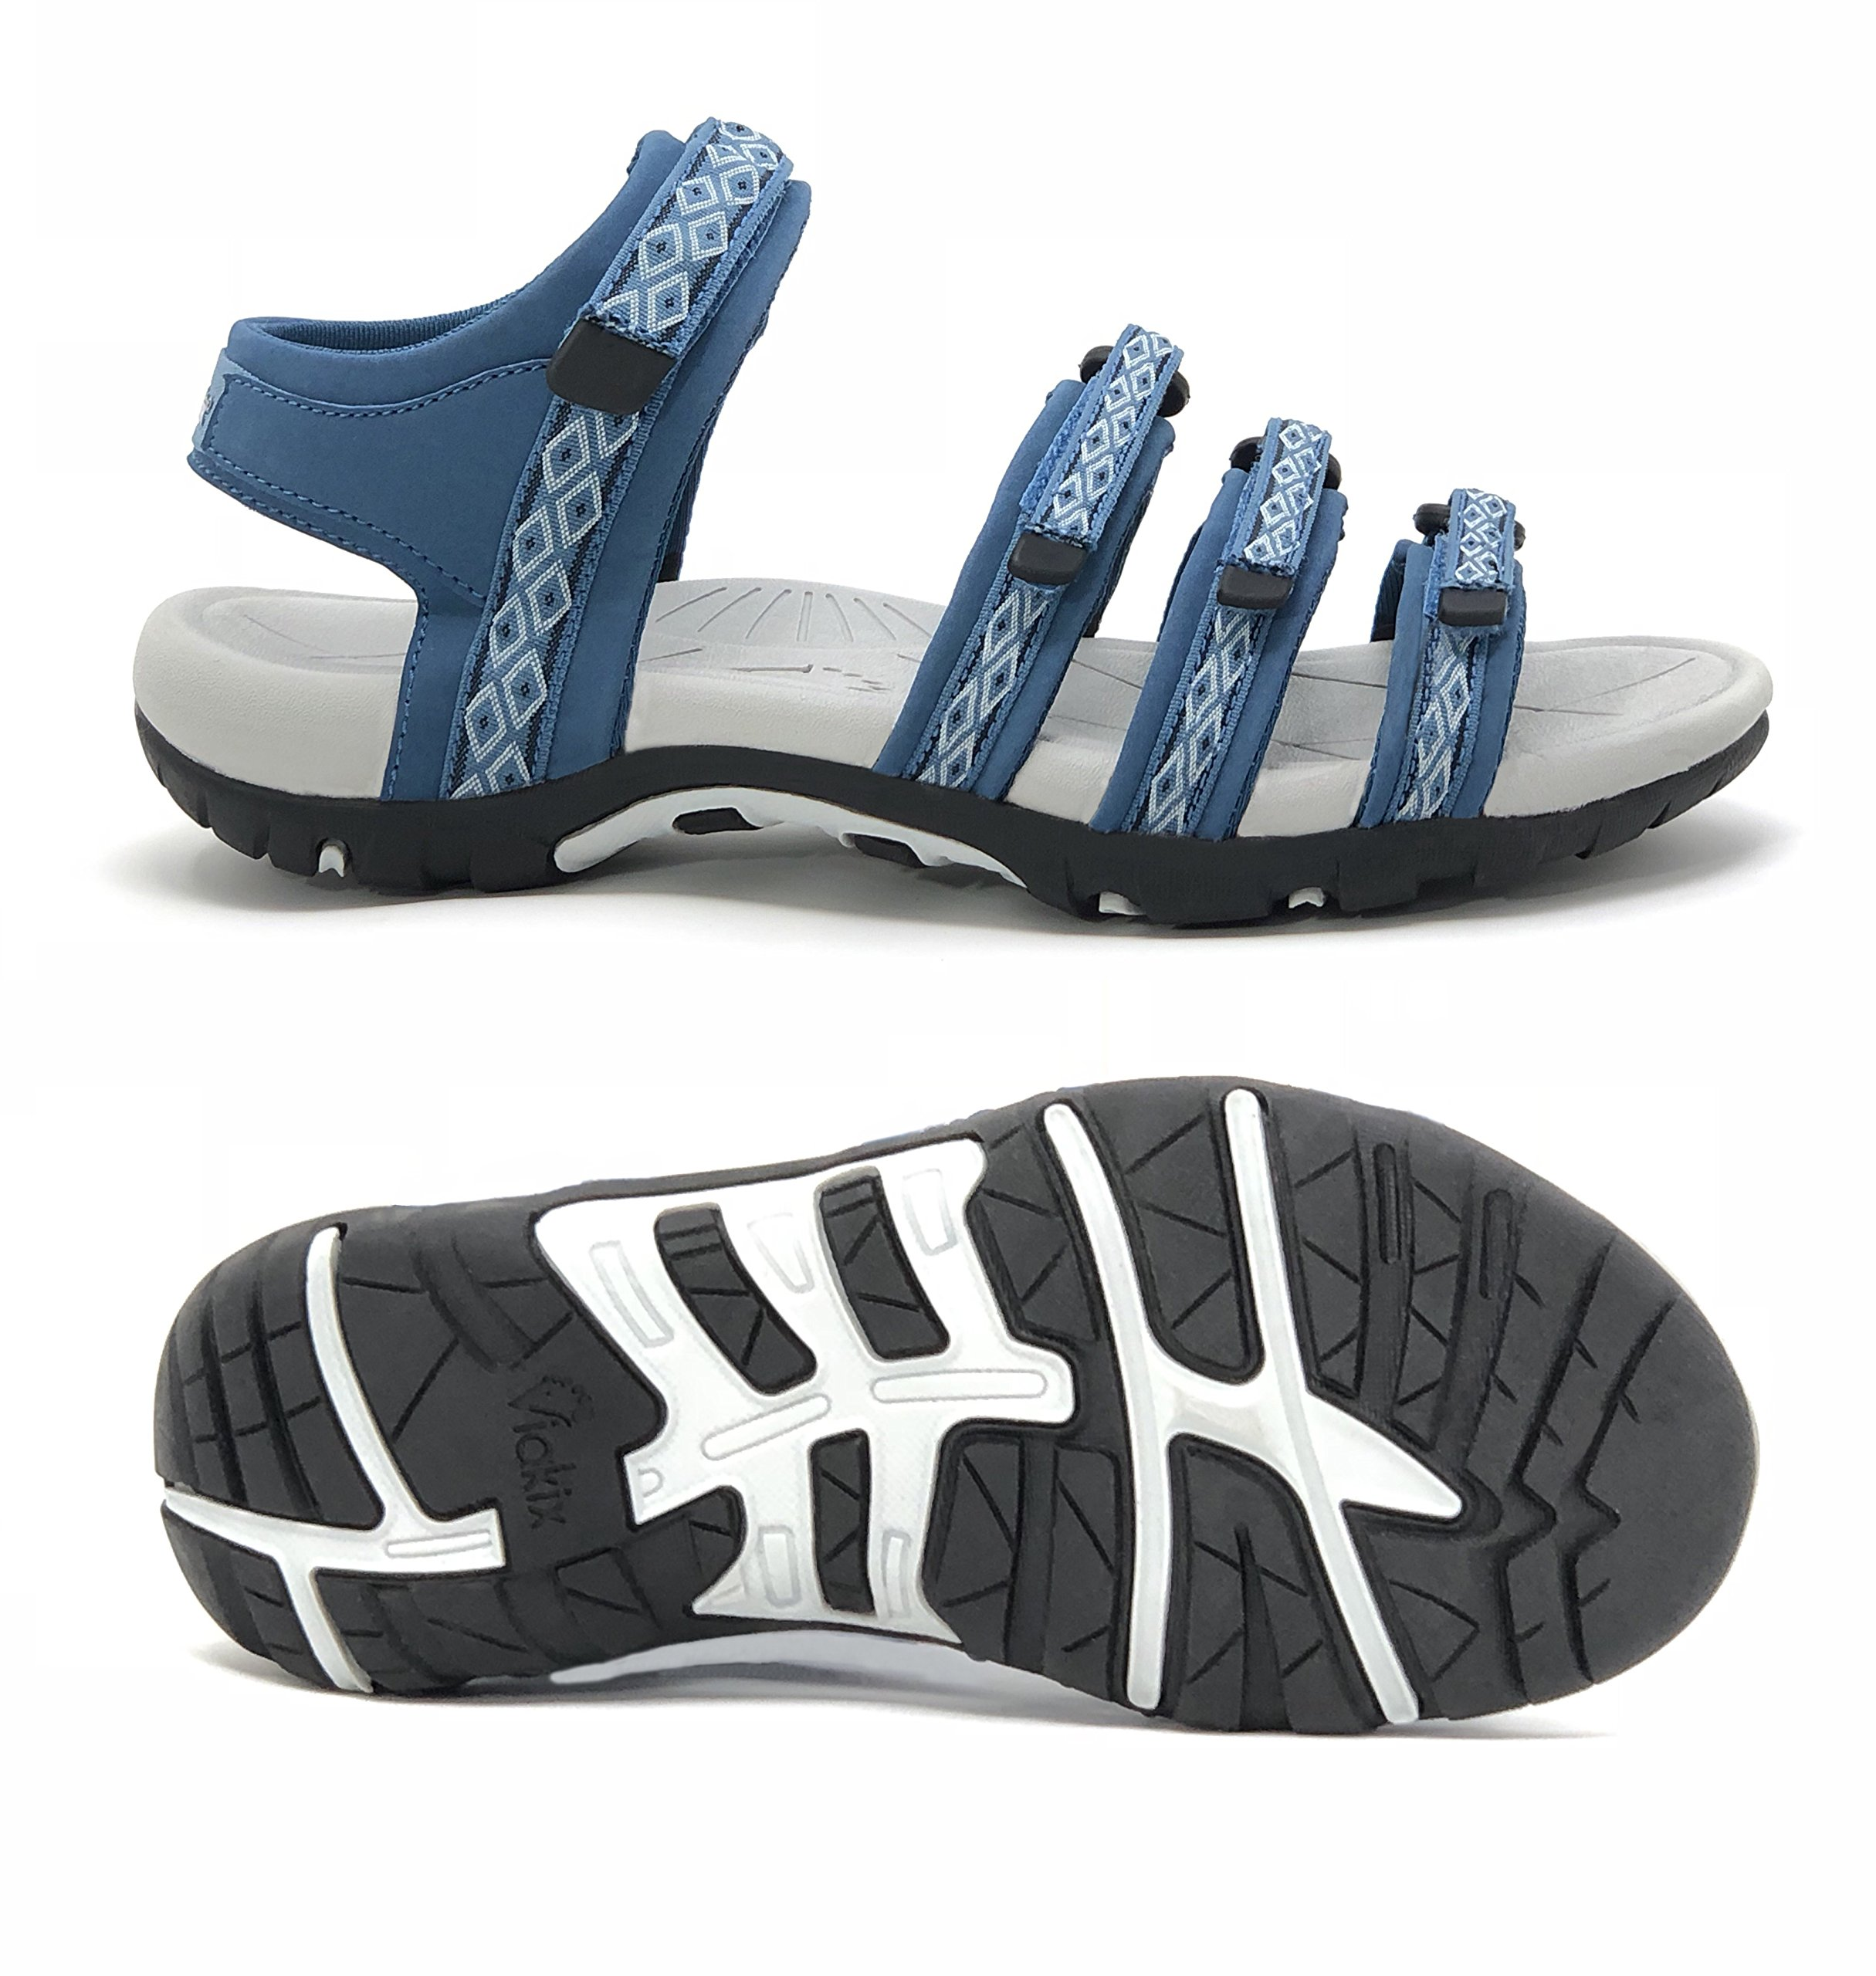 Viakix Hiking Sandals Women – Comfortable Athletic Stylish Hiking, Outdoors, Walking, Beach, Water, Sports